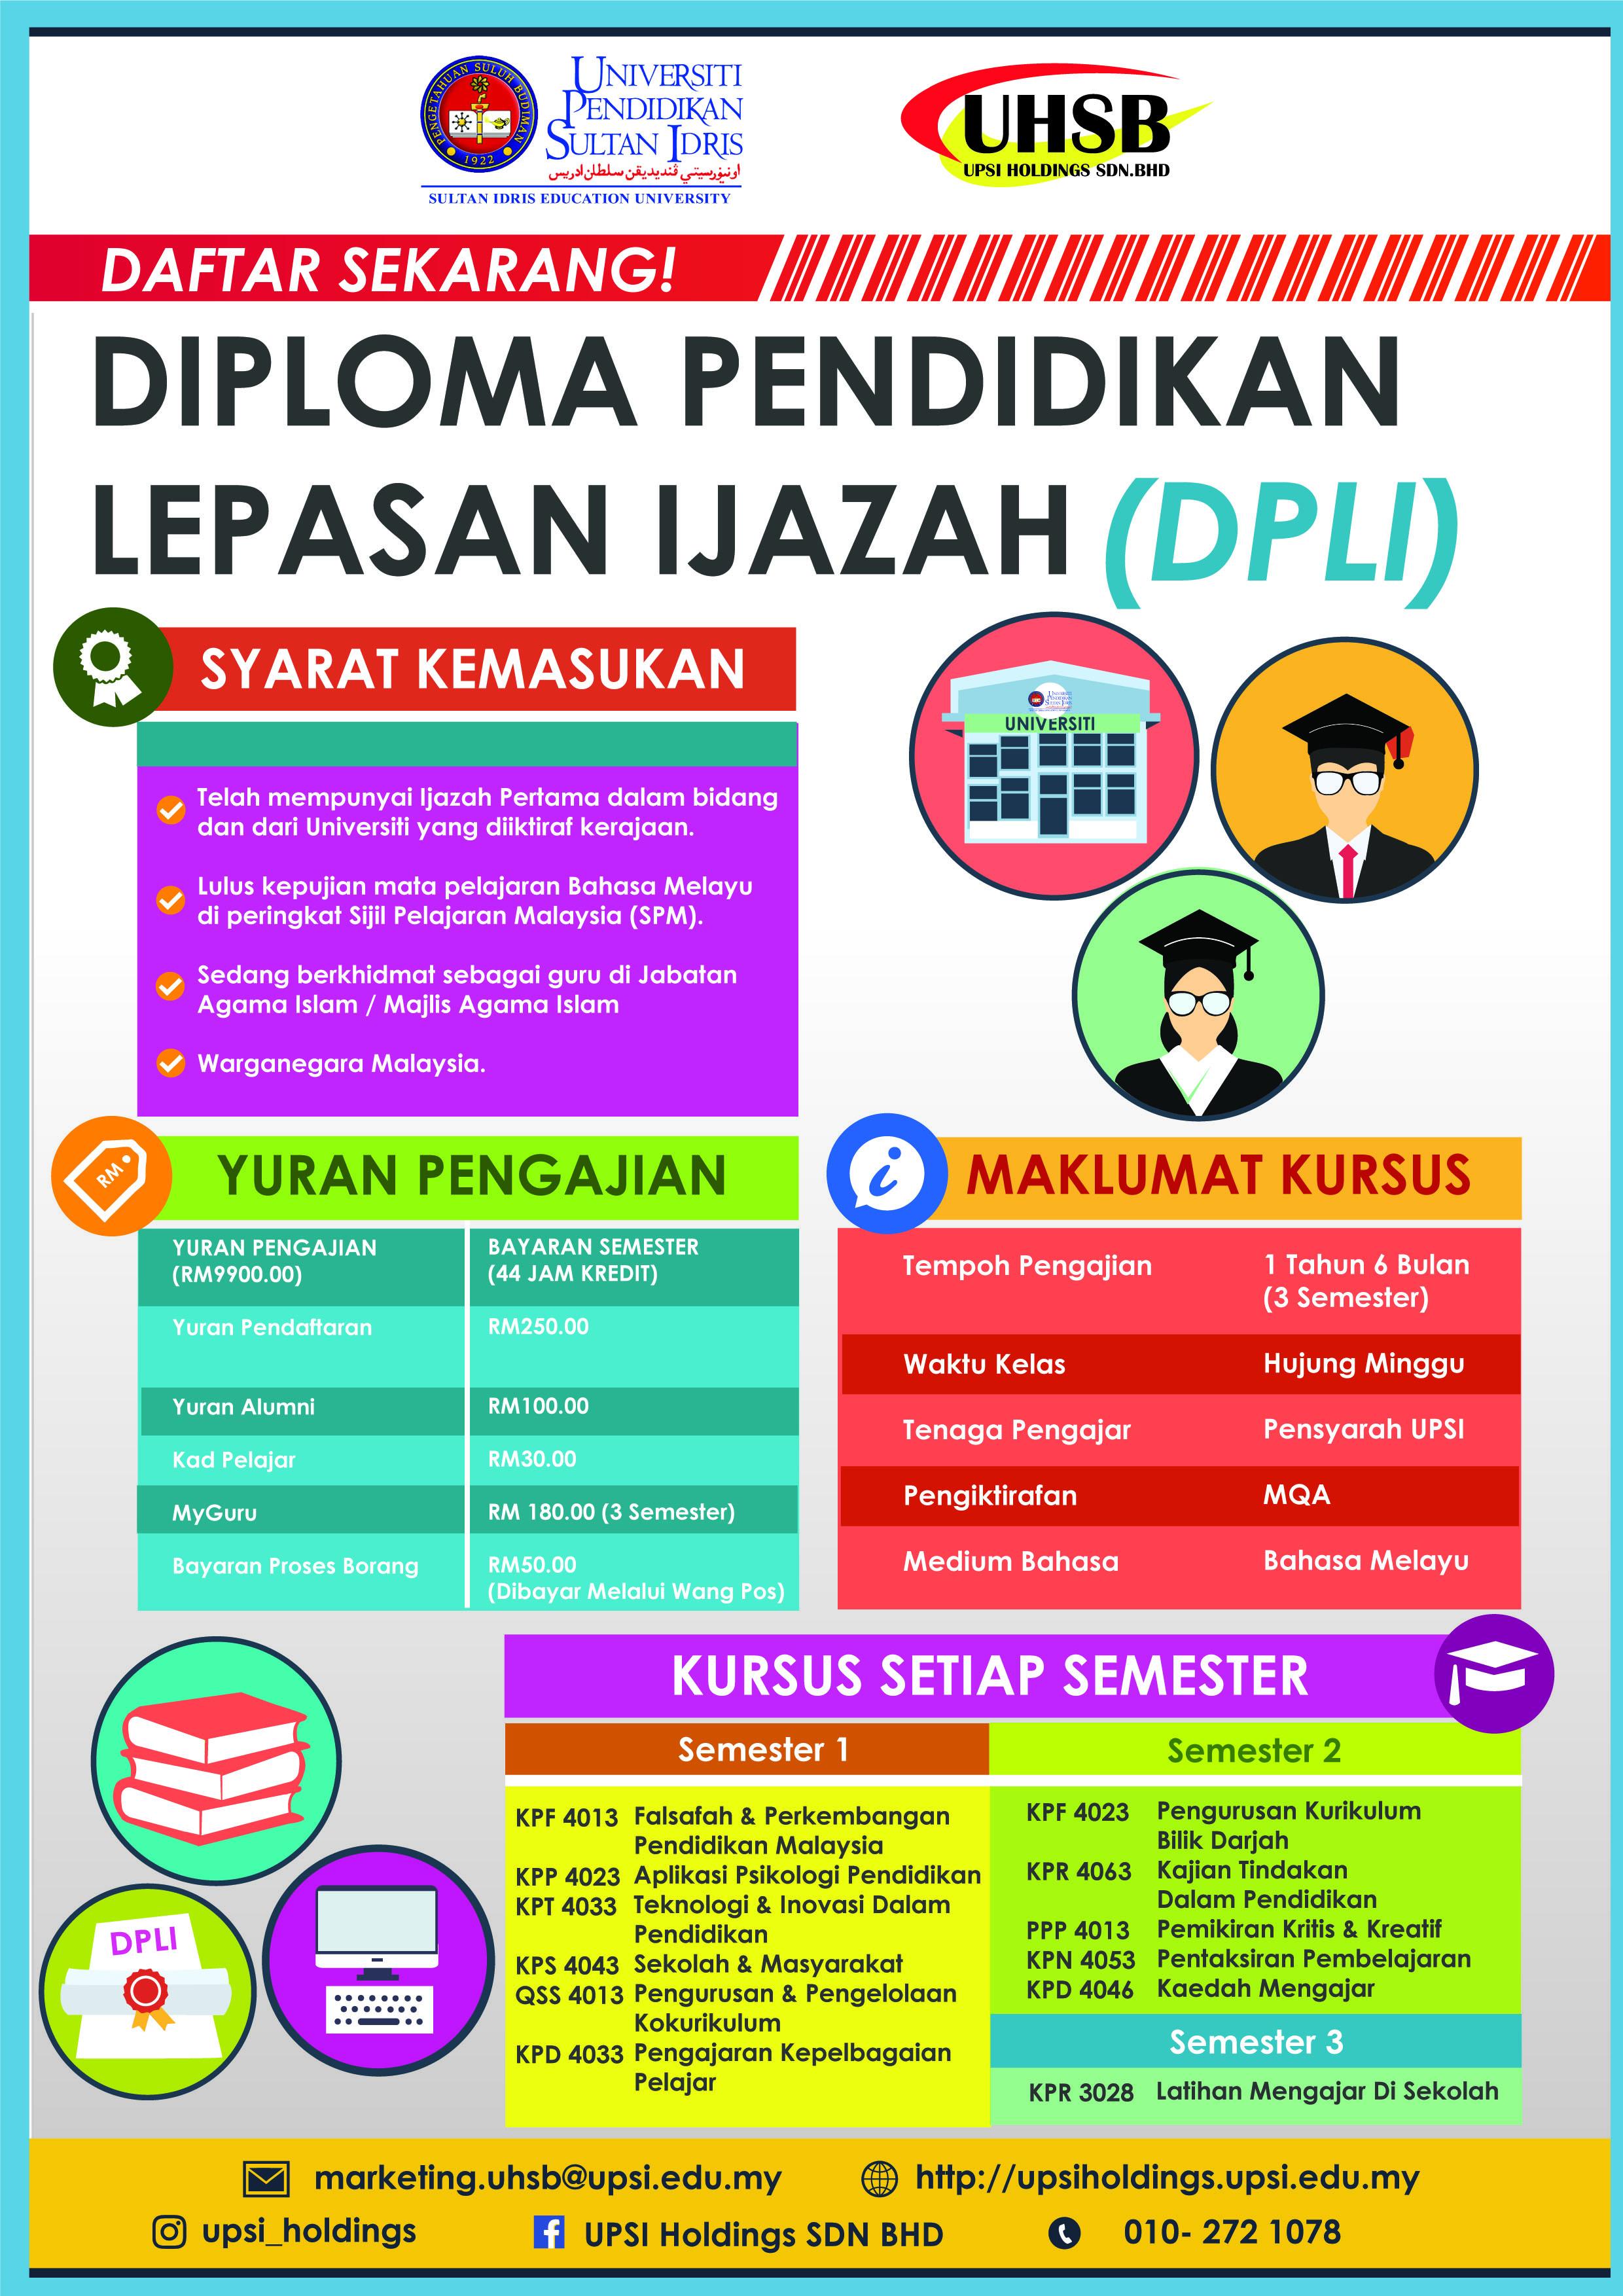 Upsi Holdings